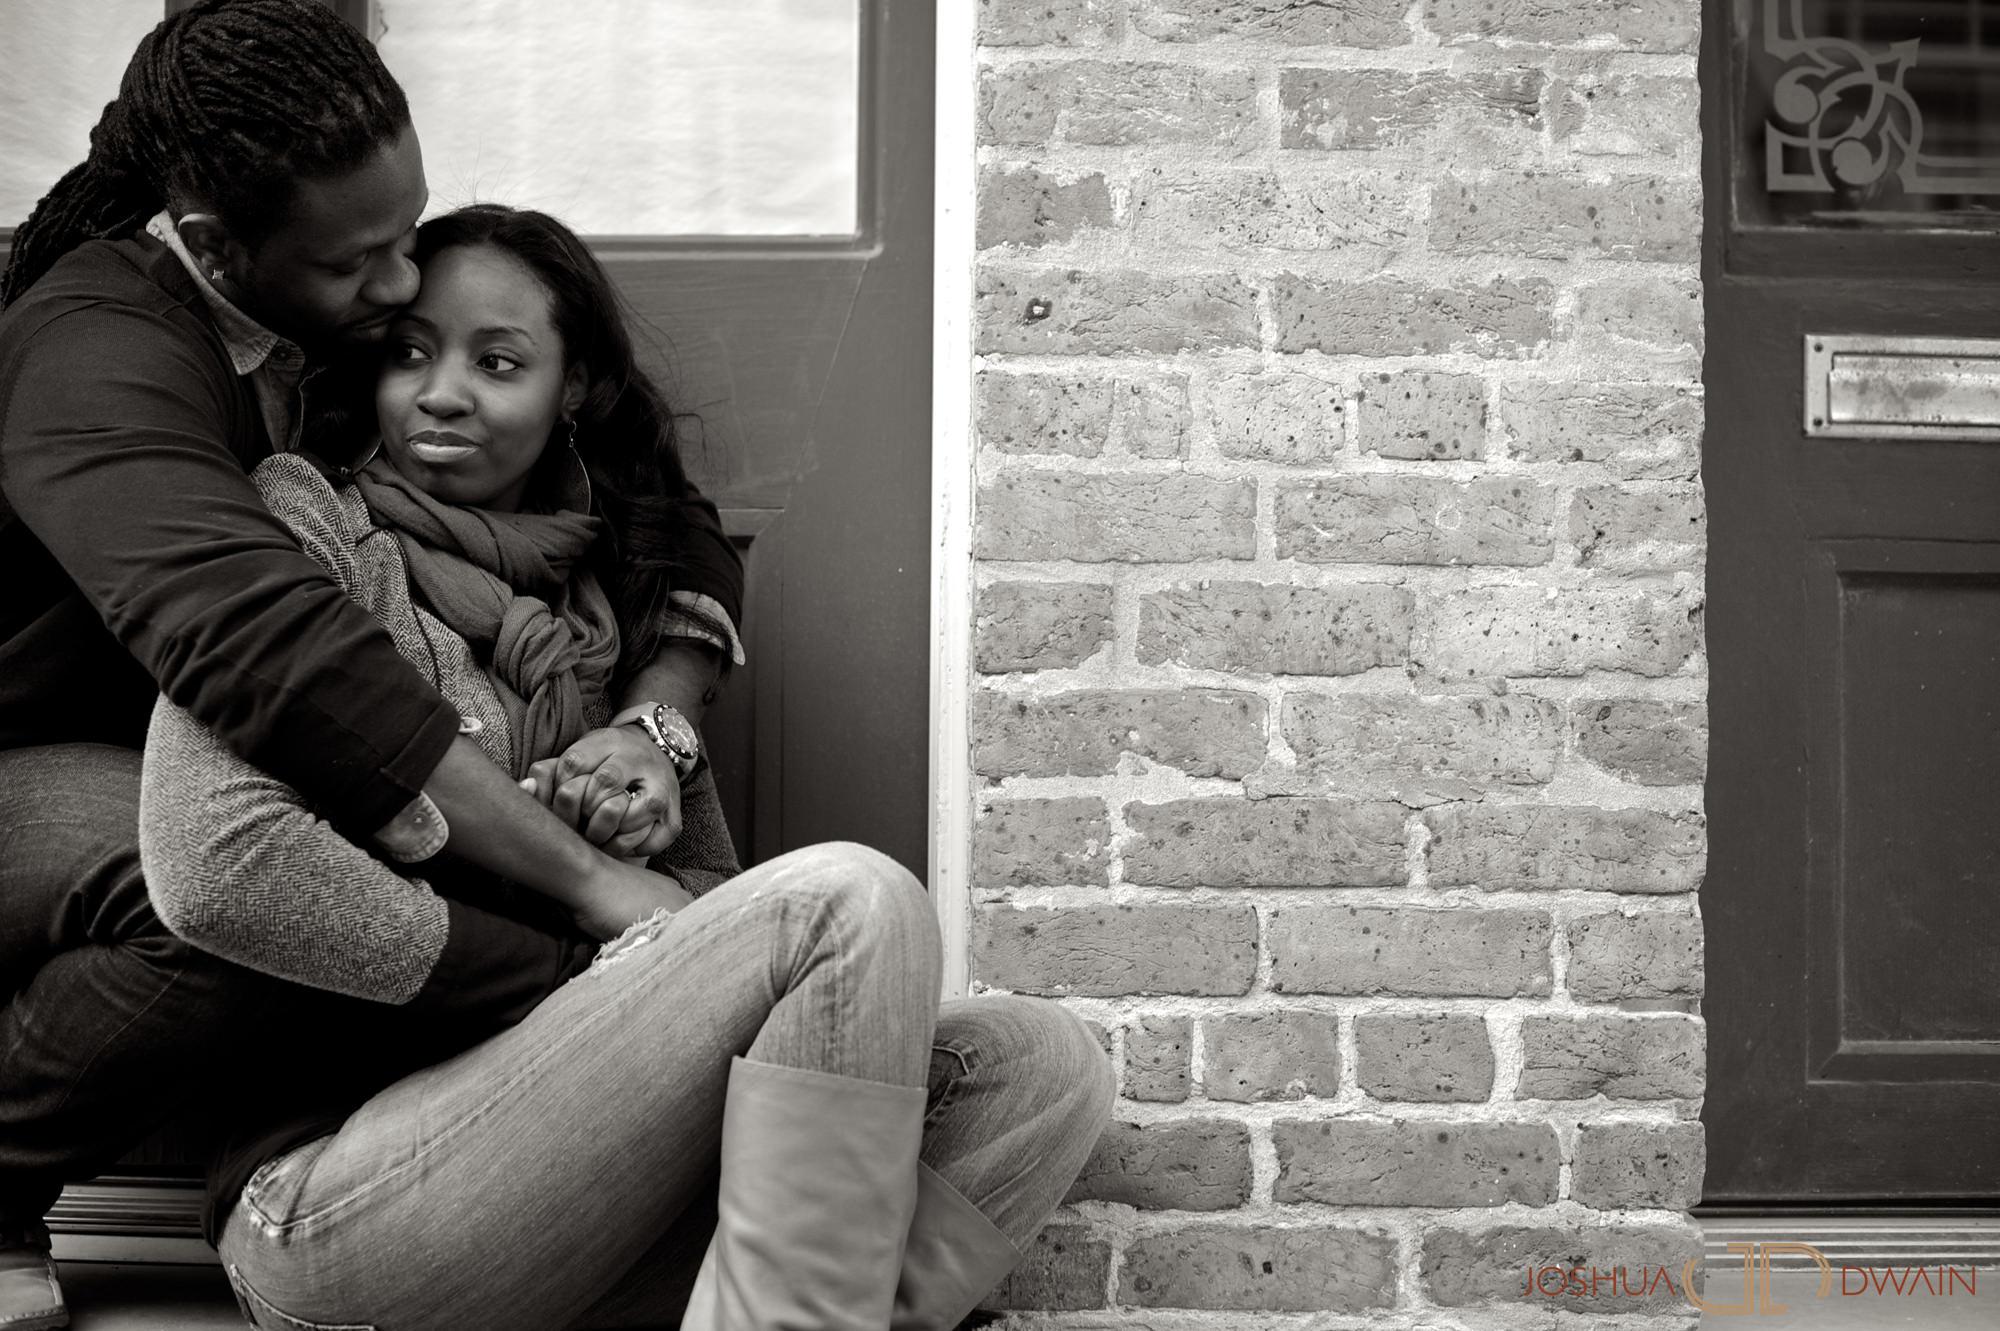 aretha-james-017-new-orleans-engagement-photographer-joshua-dwain-20101208_aj_131